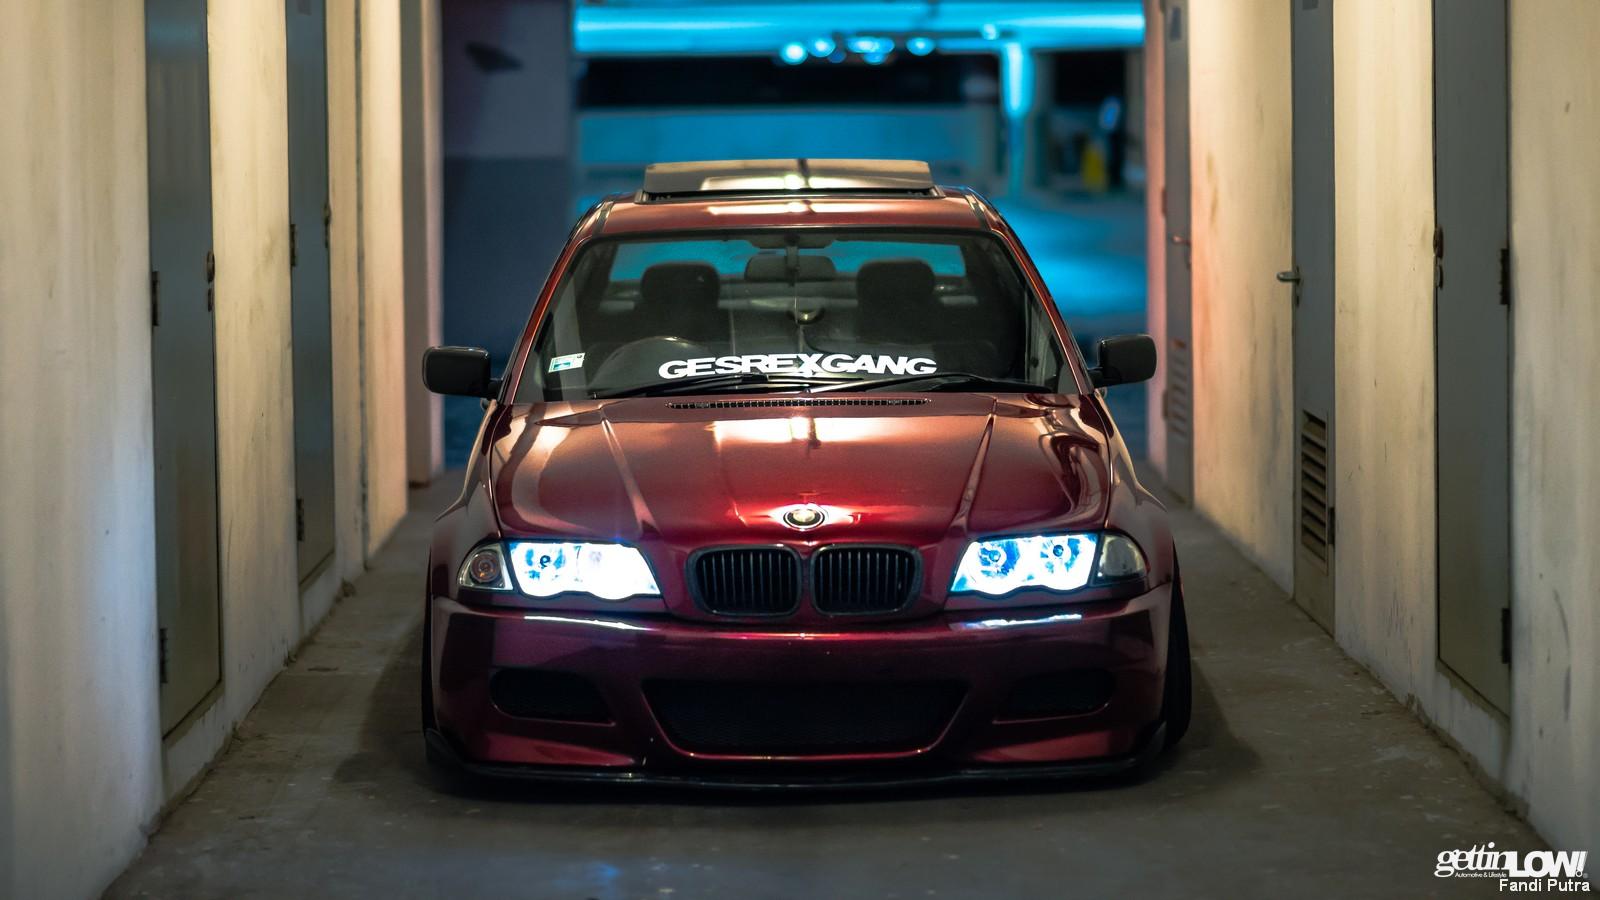 BMW-Maroon-gesrex_02